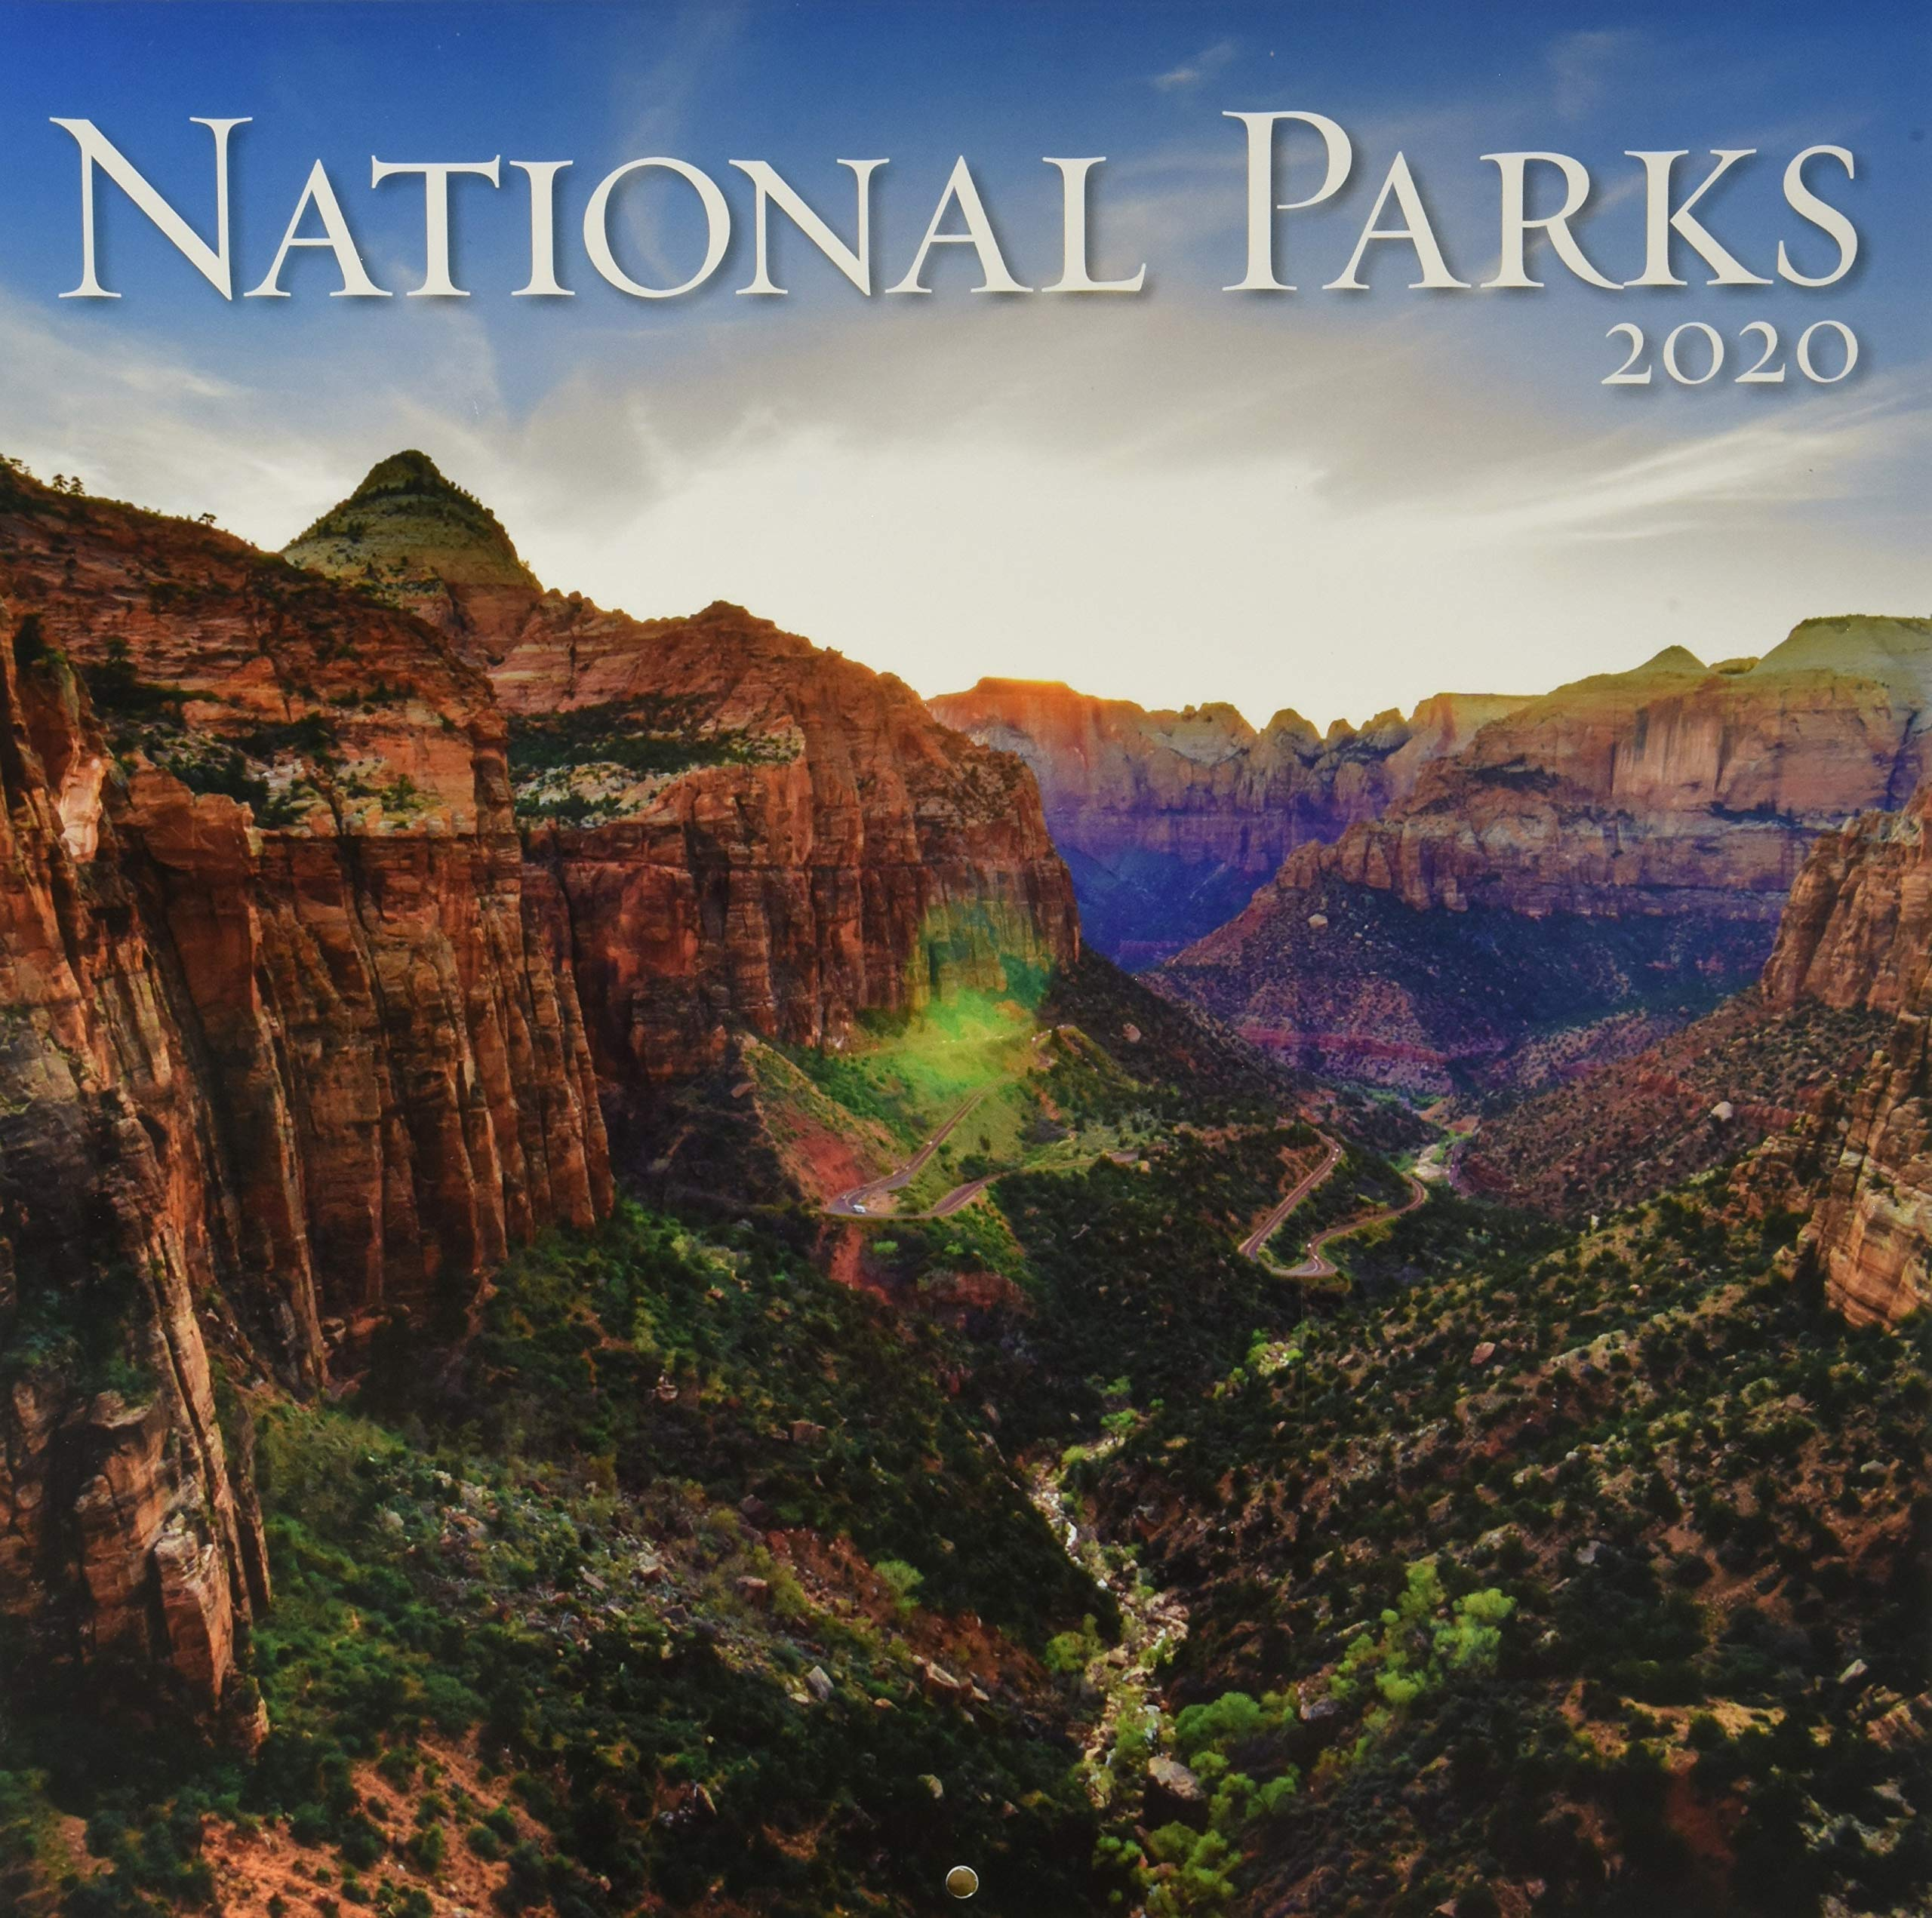 National Parks 2020 Calendar